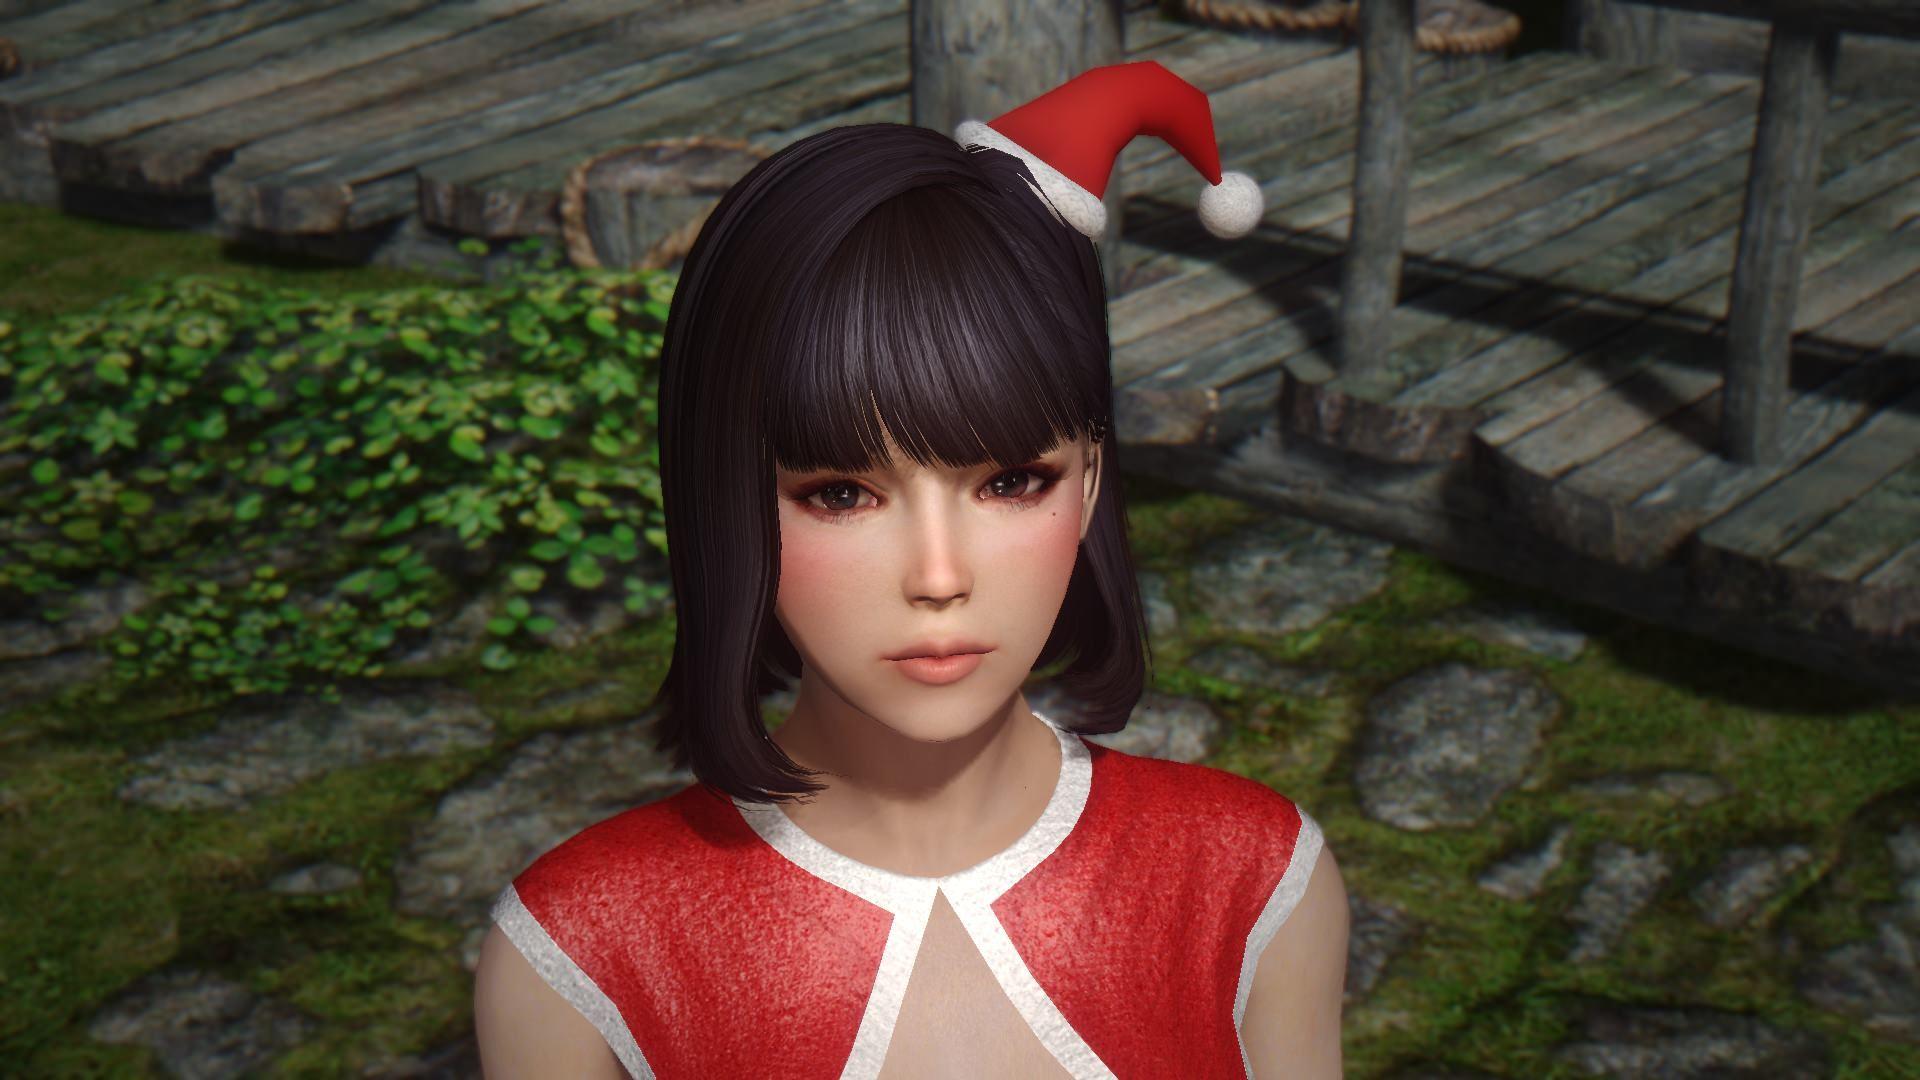 Cre_Santa_2018_UNPBO_1.jpg